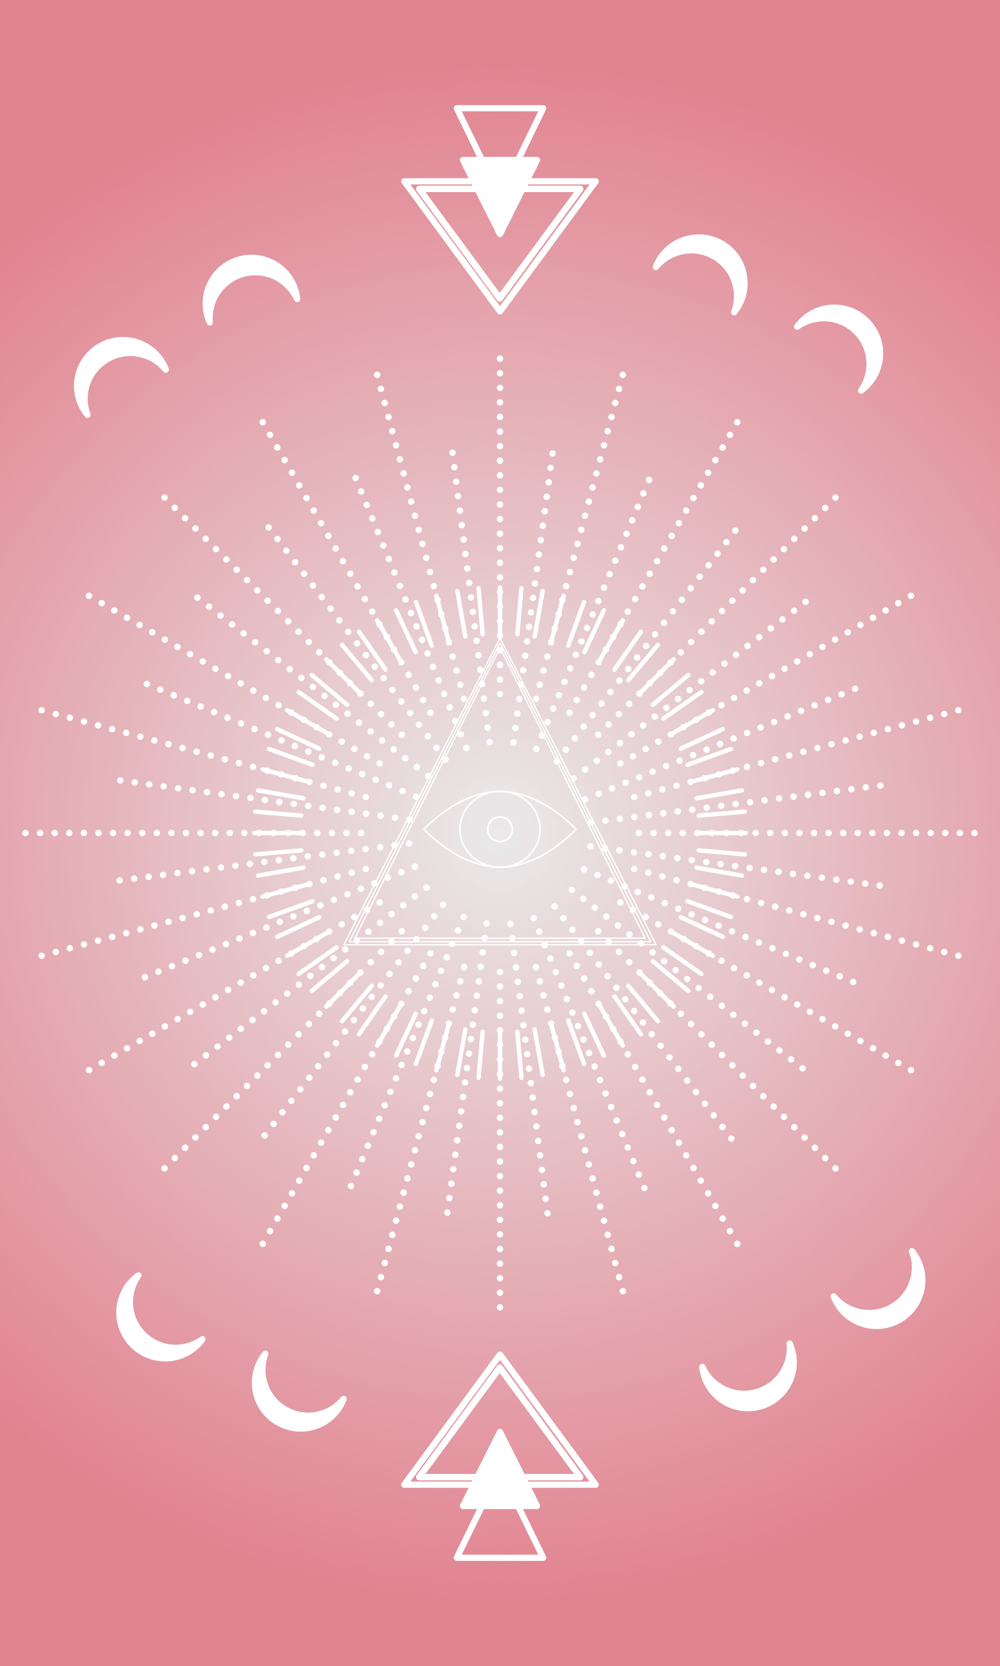 Geometric Art - image 1 - student project